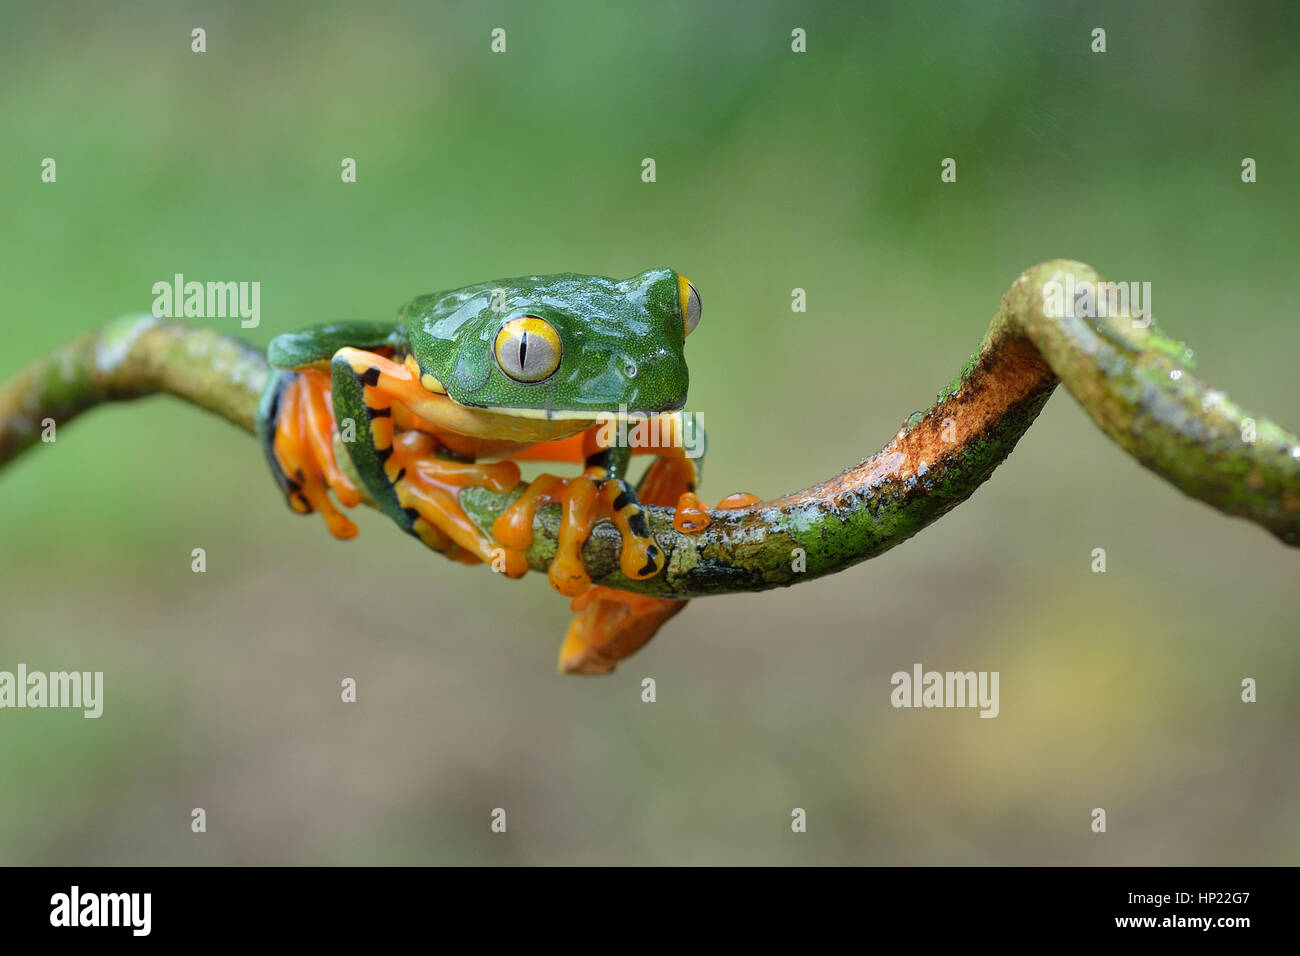 A rare Splendid Leaf frog in Costa Rica lowland rain forest Stock Photo